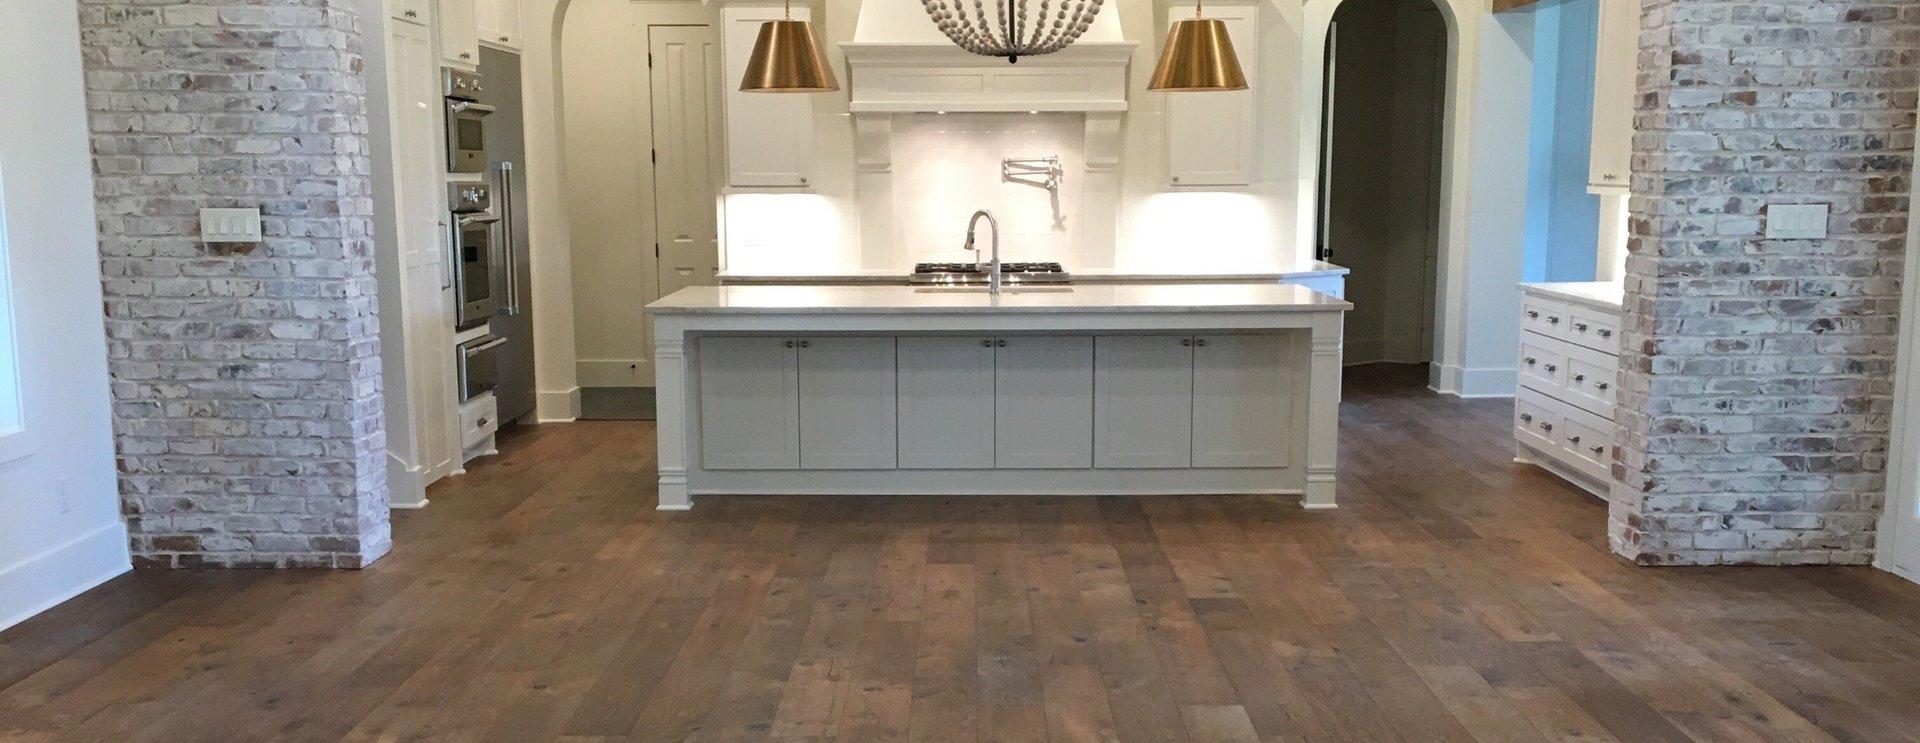 Town square floors residential flooring georgetown tx elegant hardwood flooring dailygadgetfo Image collections